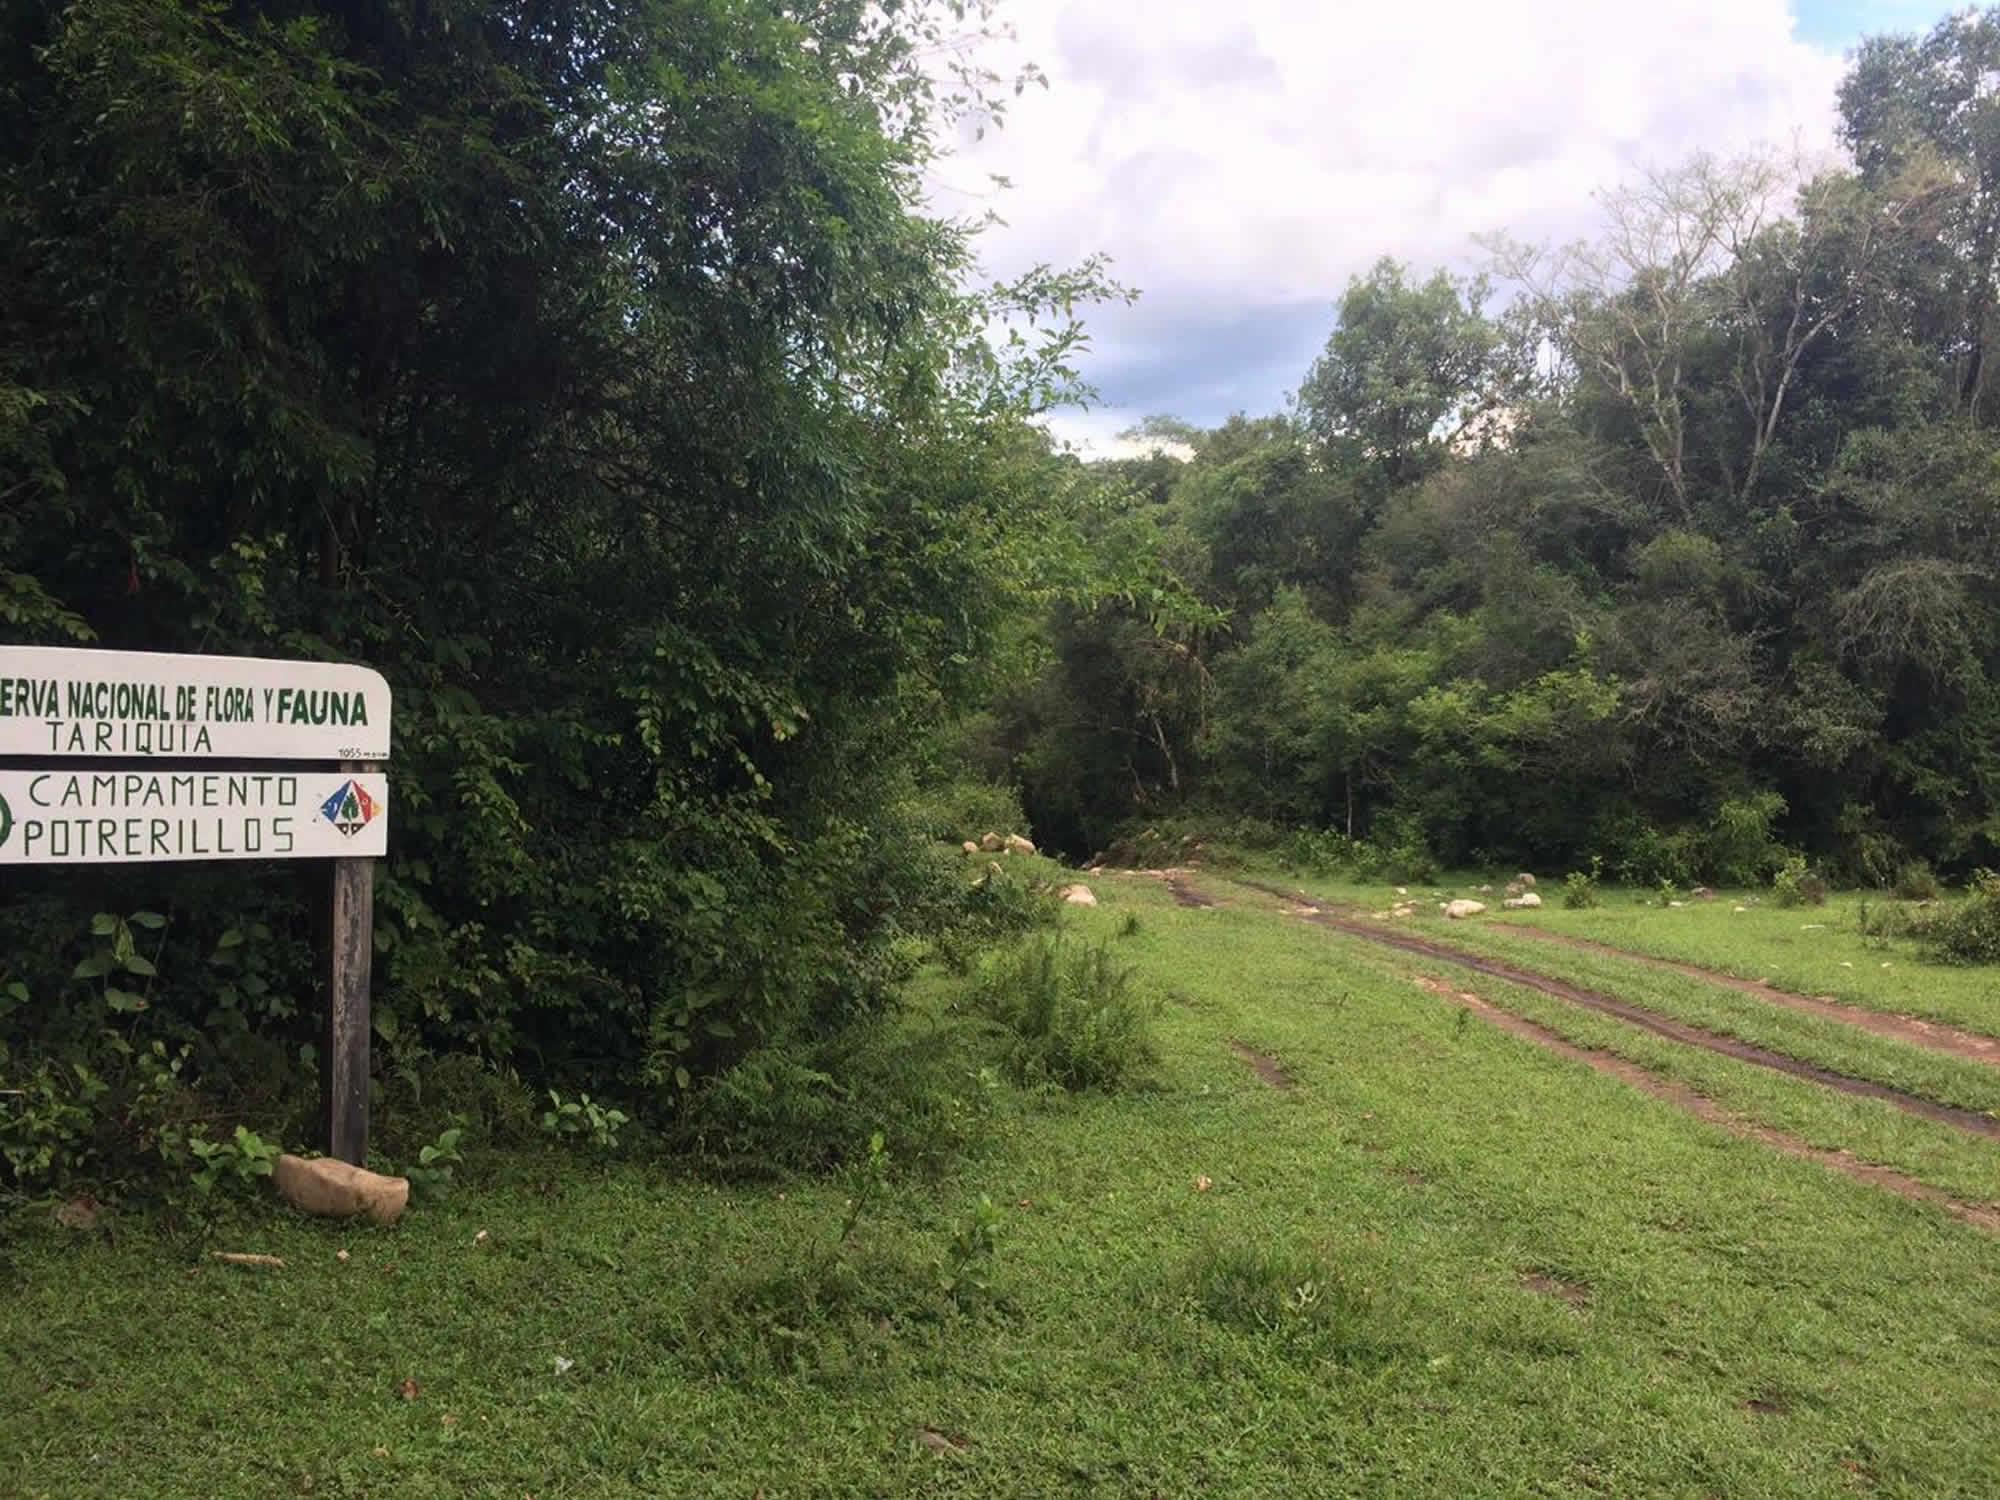 Tariquia Flora and Fauna Reserve